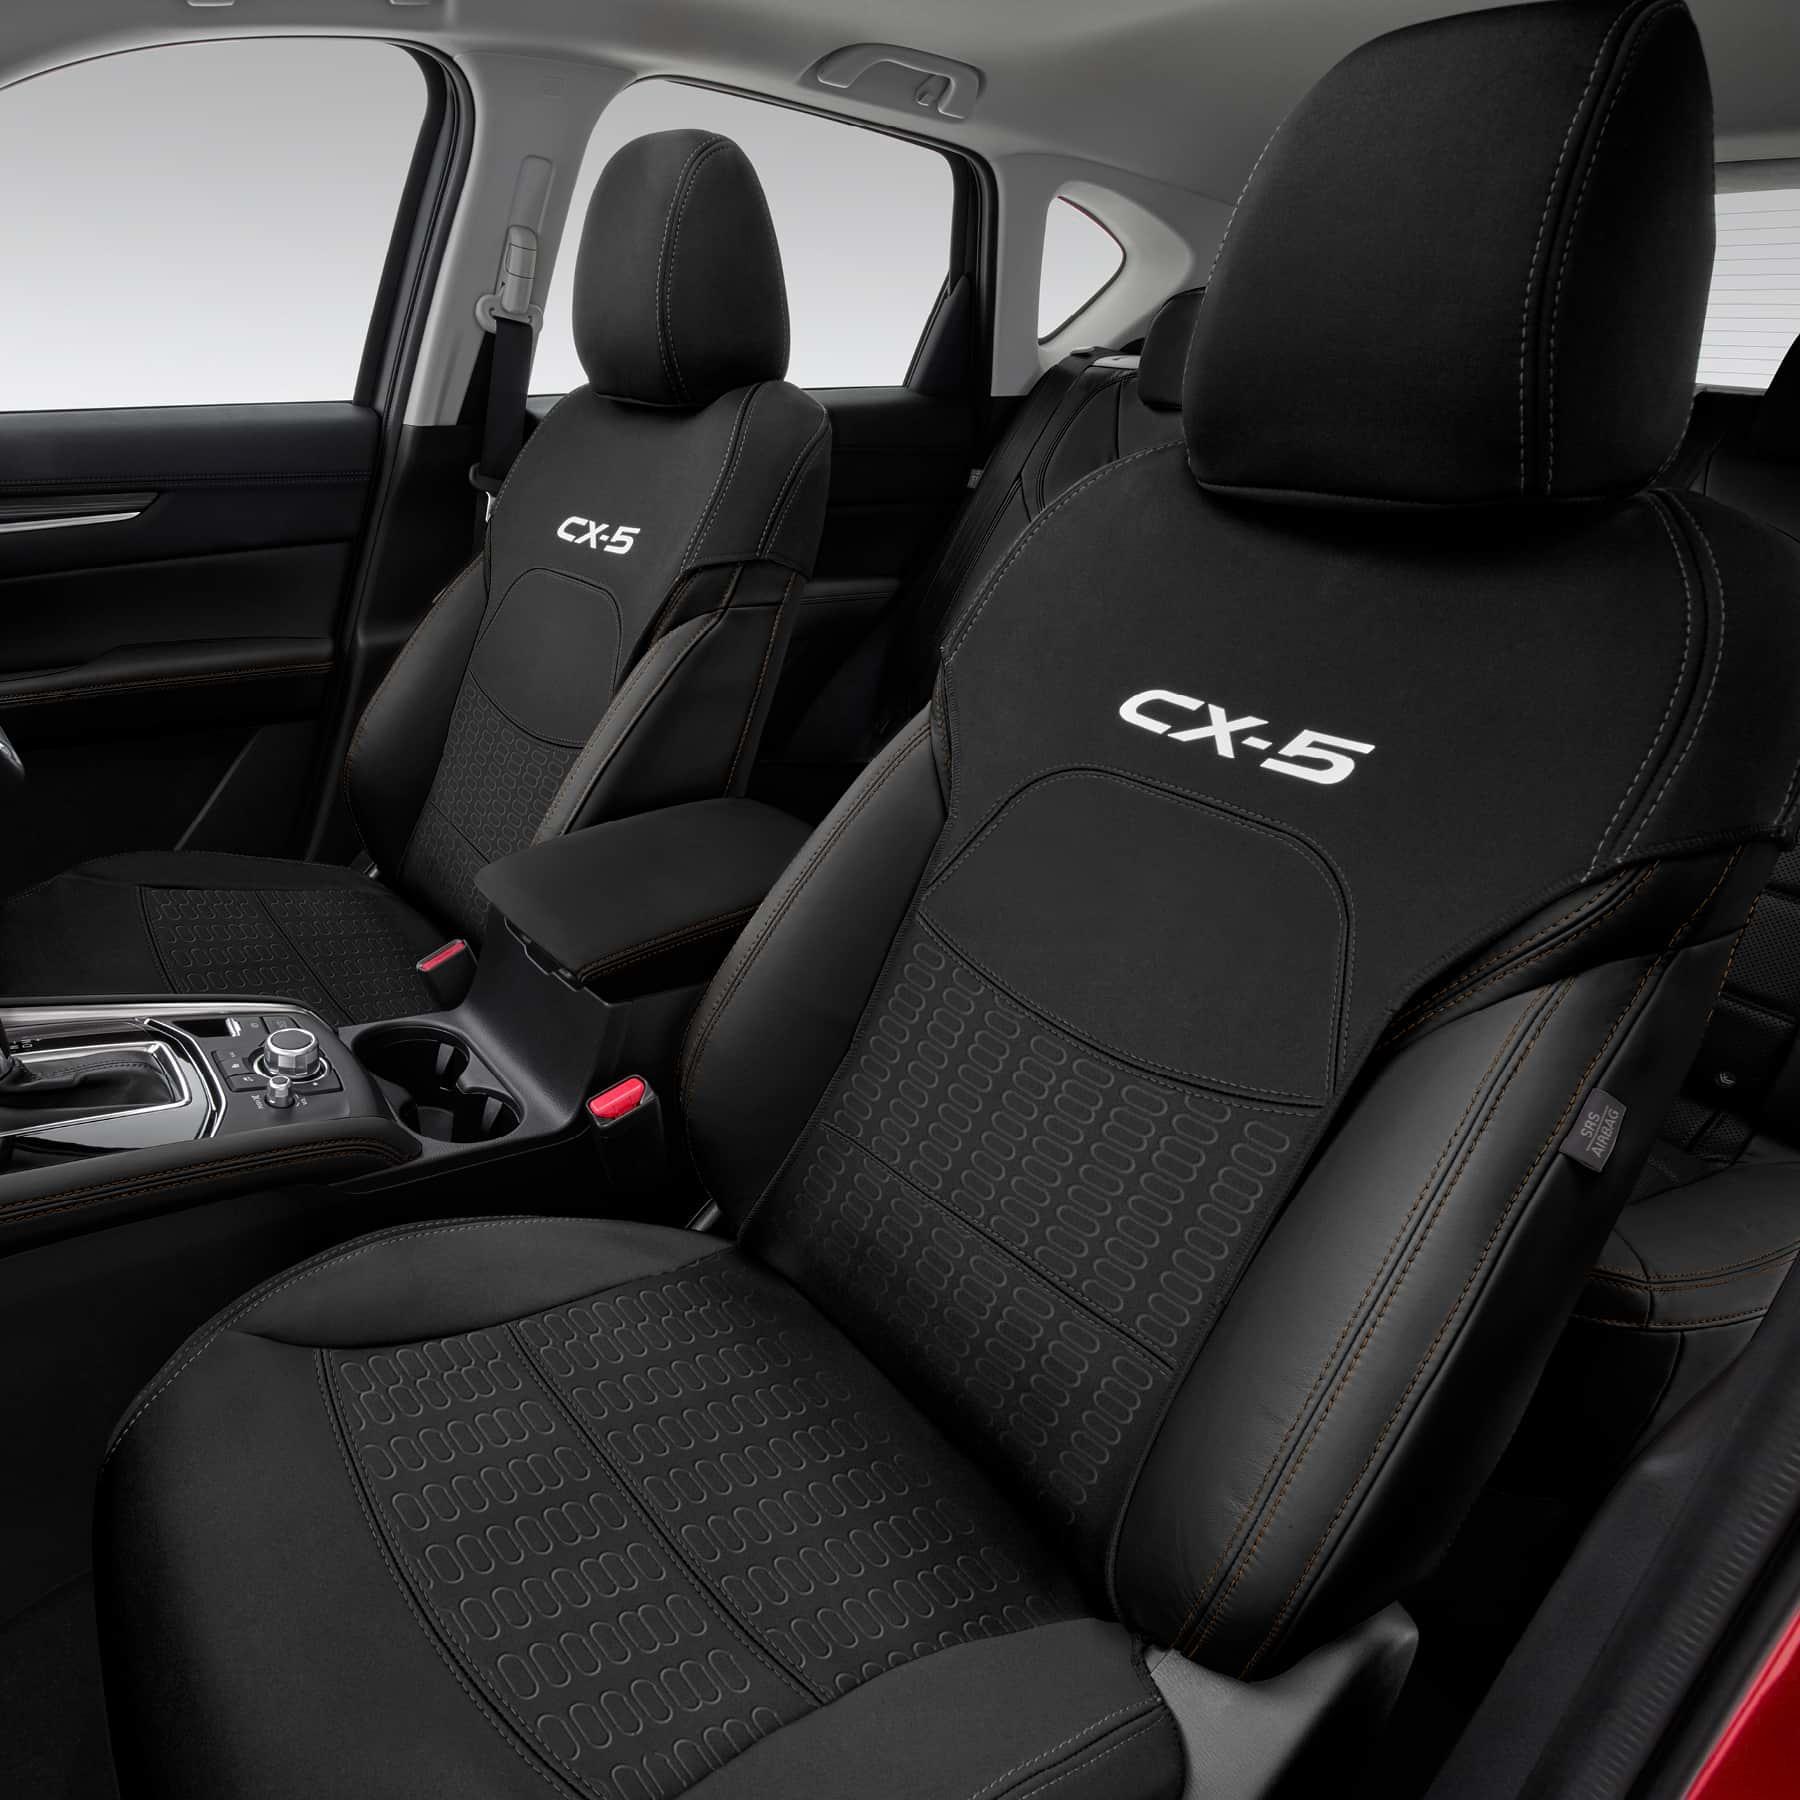 New Genuine Mazda Set Of 2 KF CX 5 Front Seat Covers Neoprene CX5 KF11ACSCF